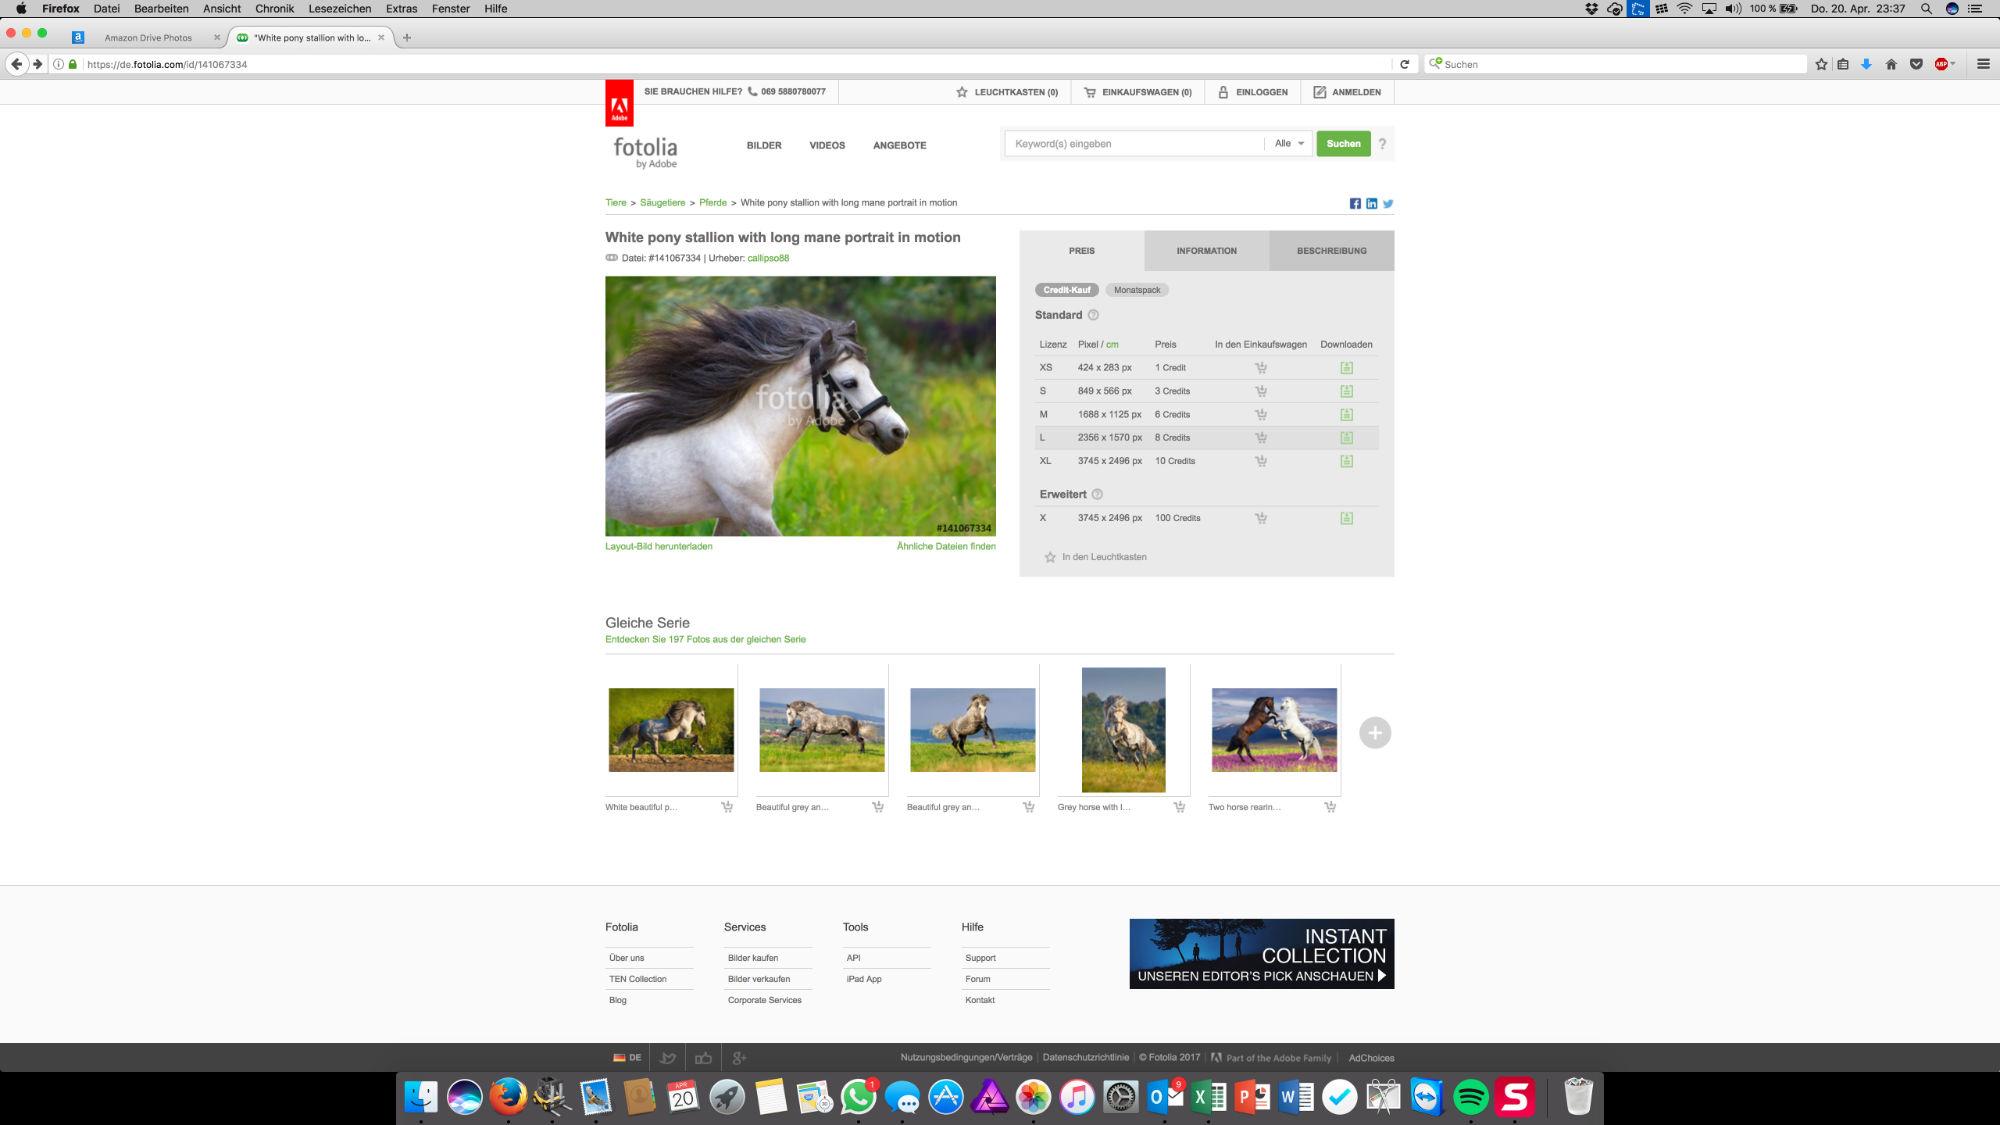 Bananapapa - Saal Digital Fotoleinwand - Fotolia Screenshot